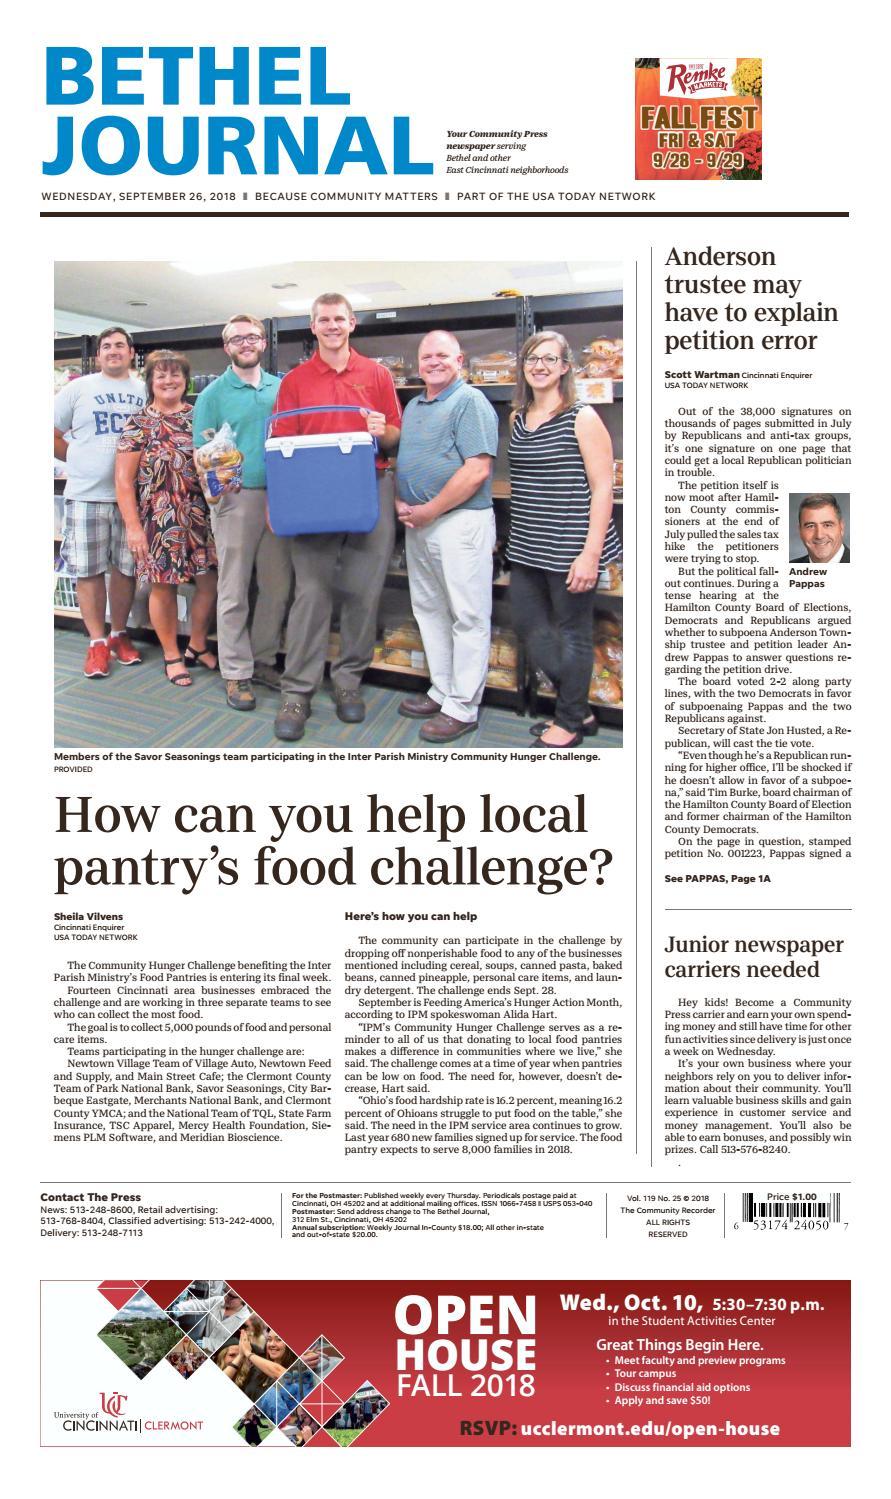 Bethel Journal 09/26/18 by Enquirer Media - issuu